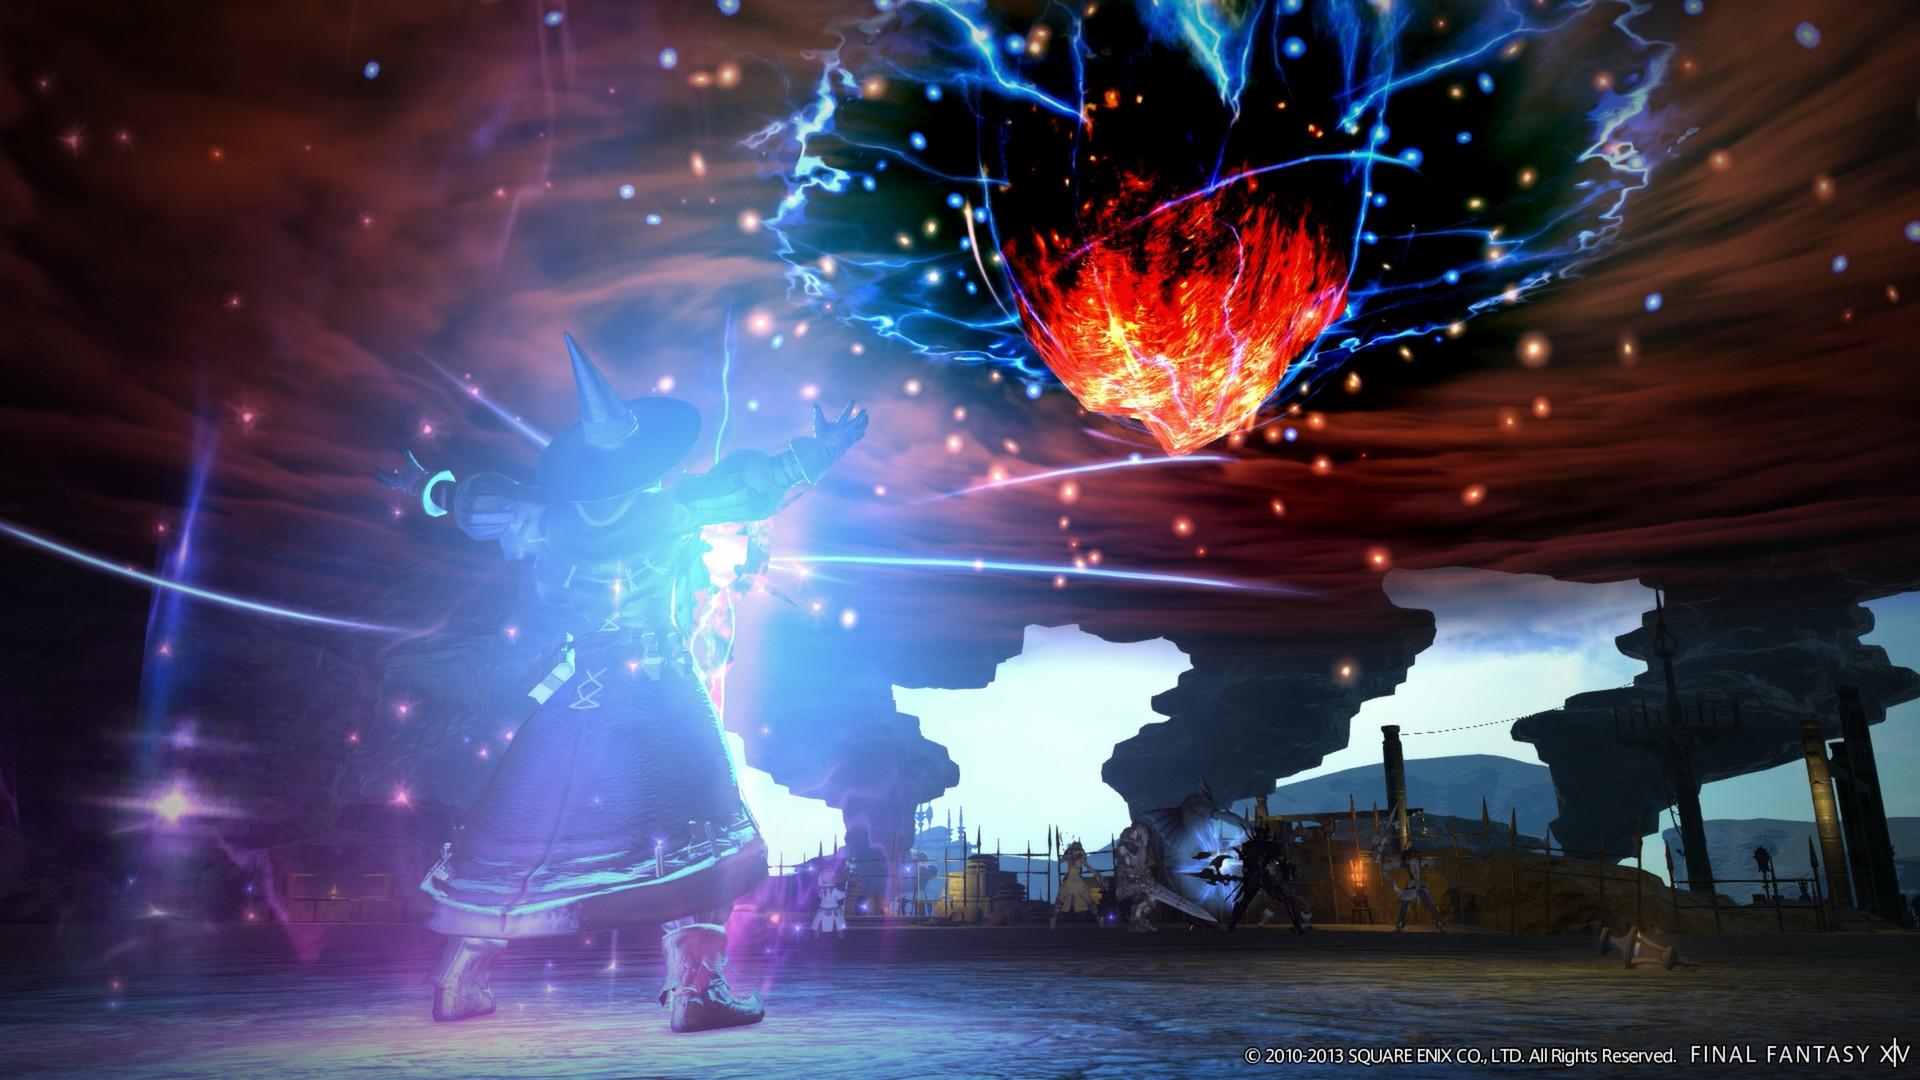 Final Fantasy Xiv Online On Steam